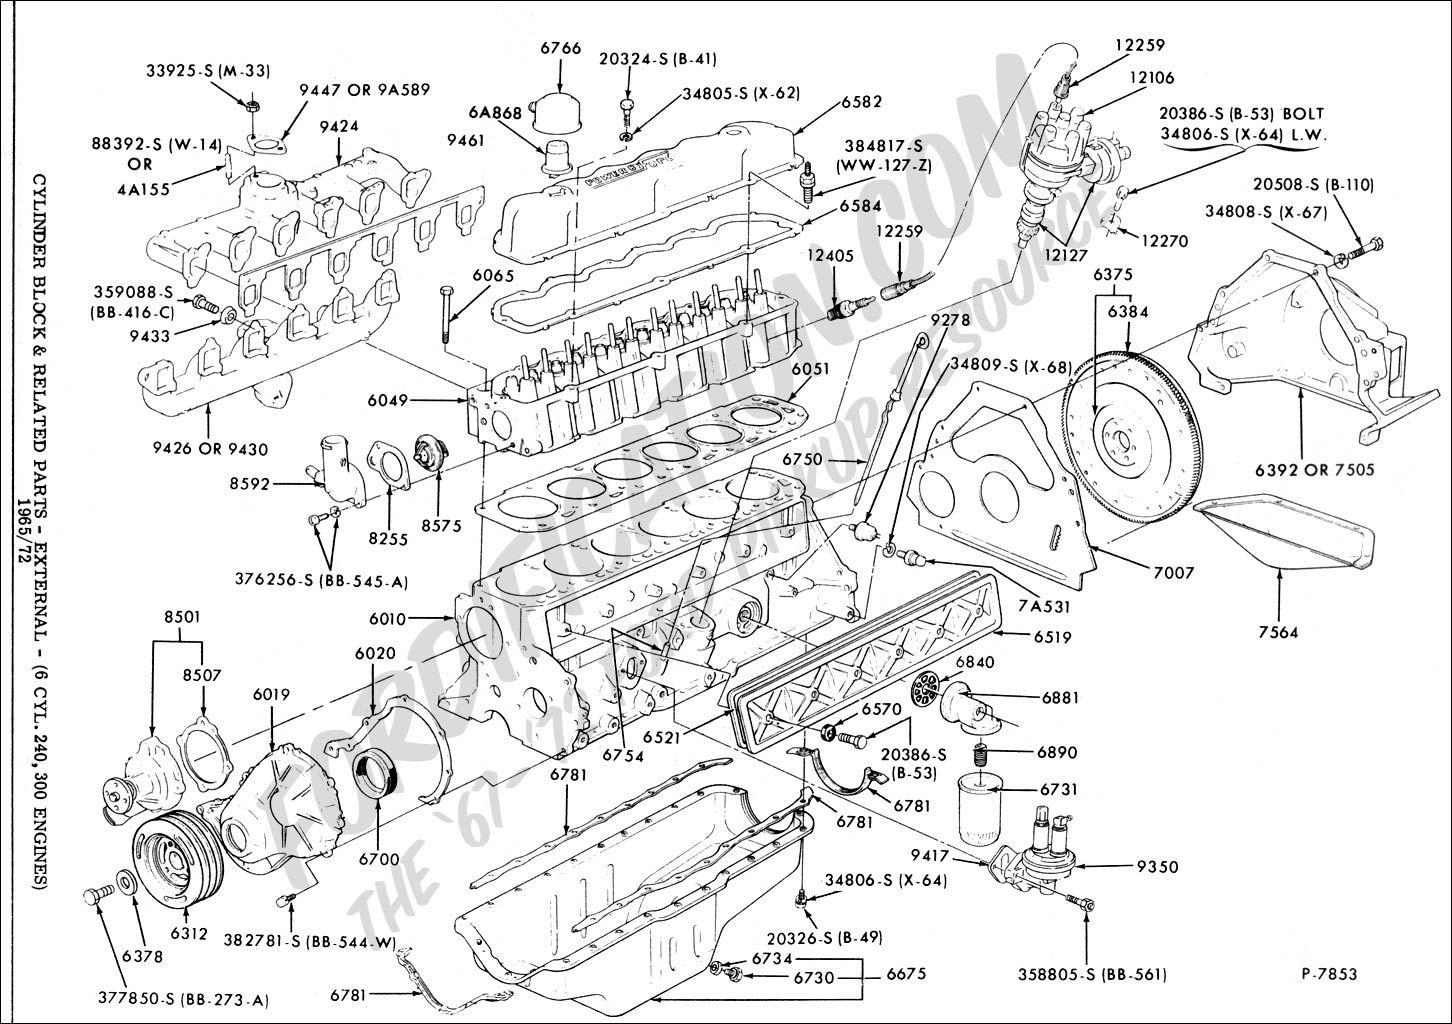 Ford Straight 6 Engine Diagram | BB | Ford trucks, Ford